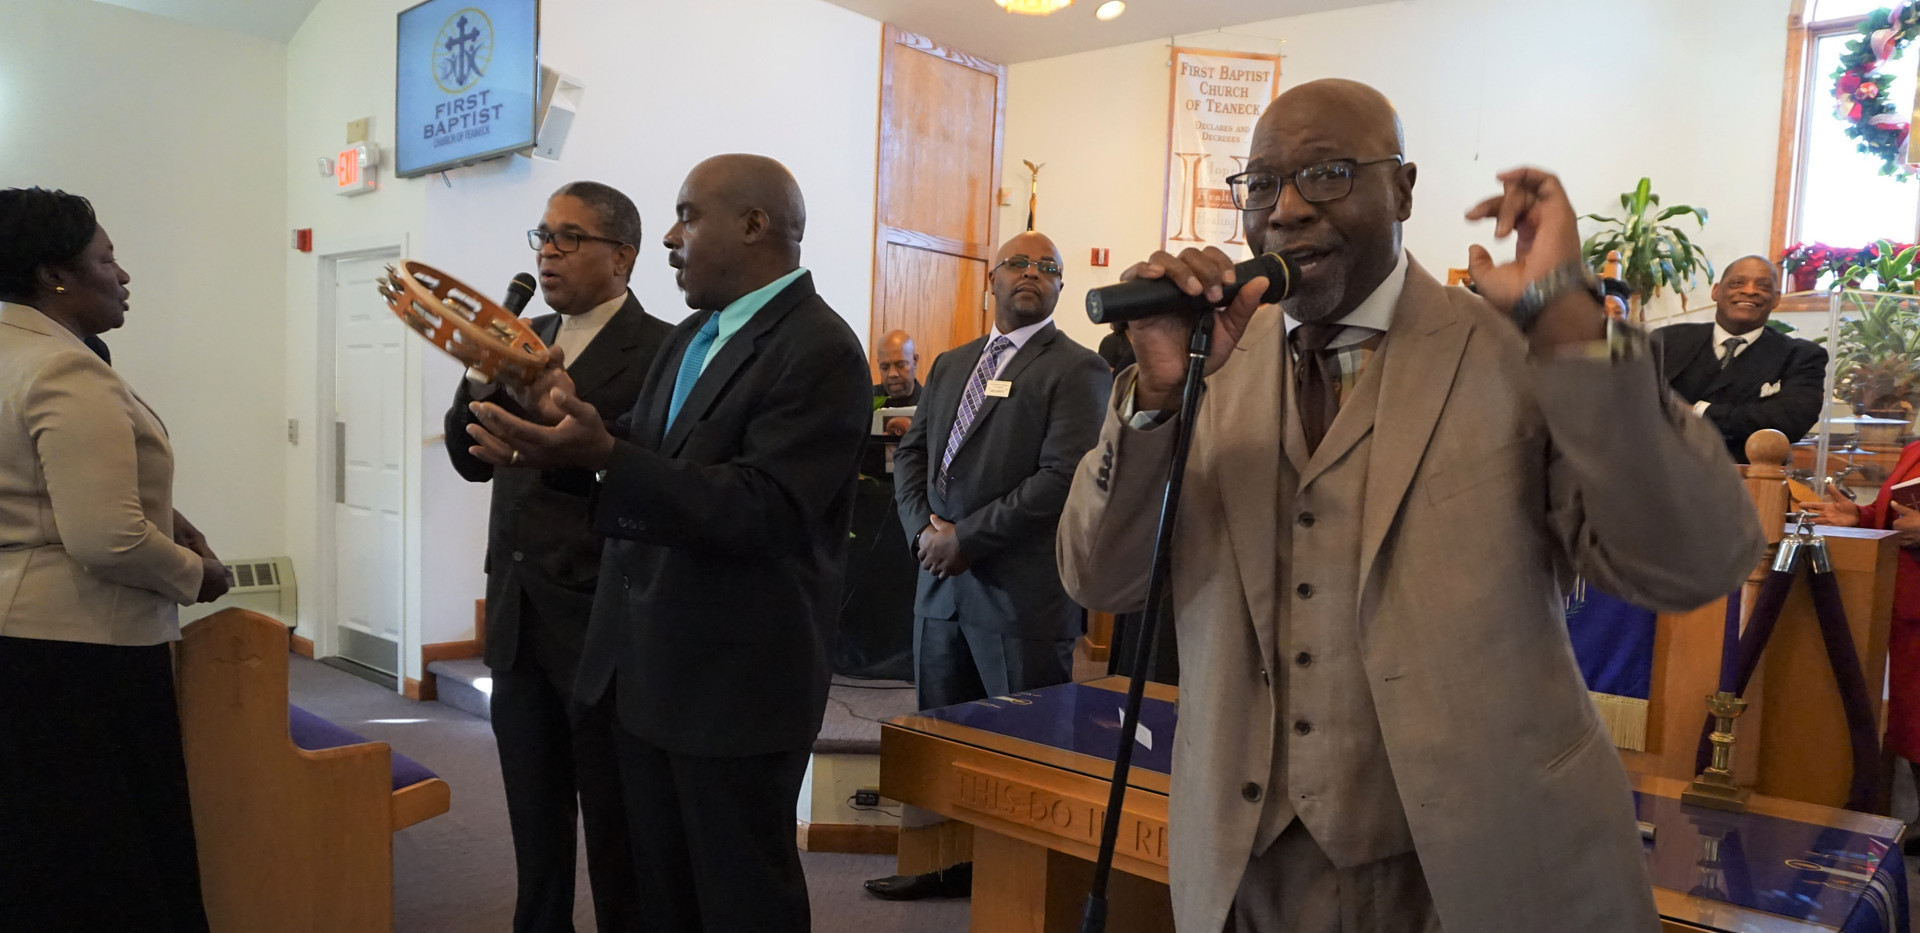 12-8-19 FBCT ON TIME SENIOR MINISTRY DAY